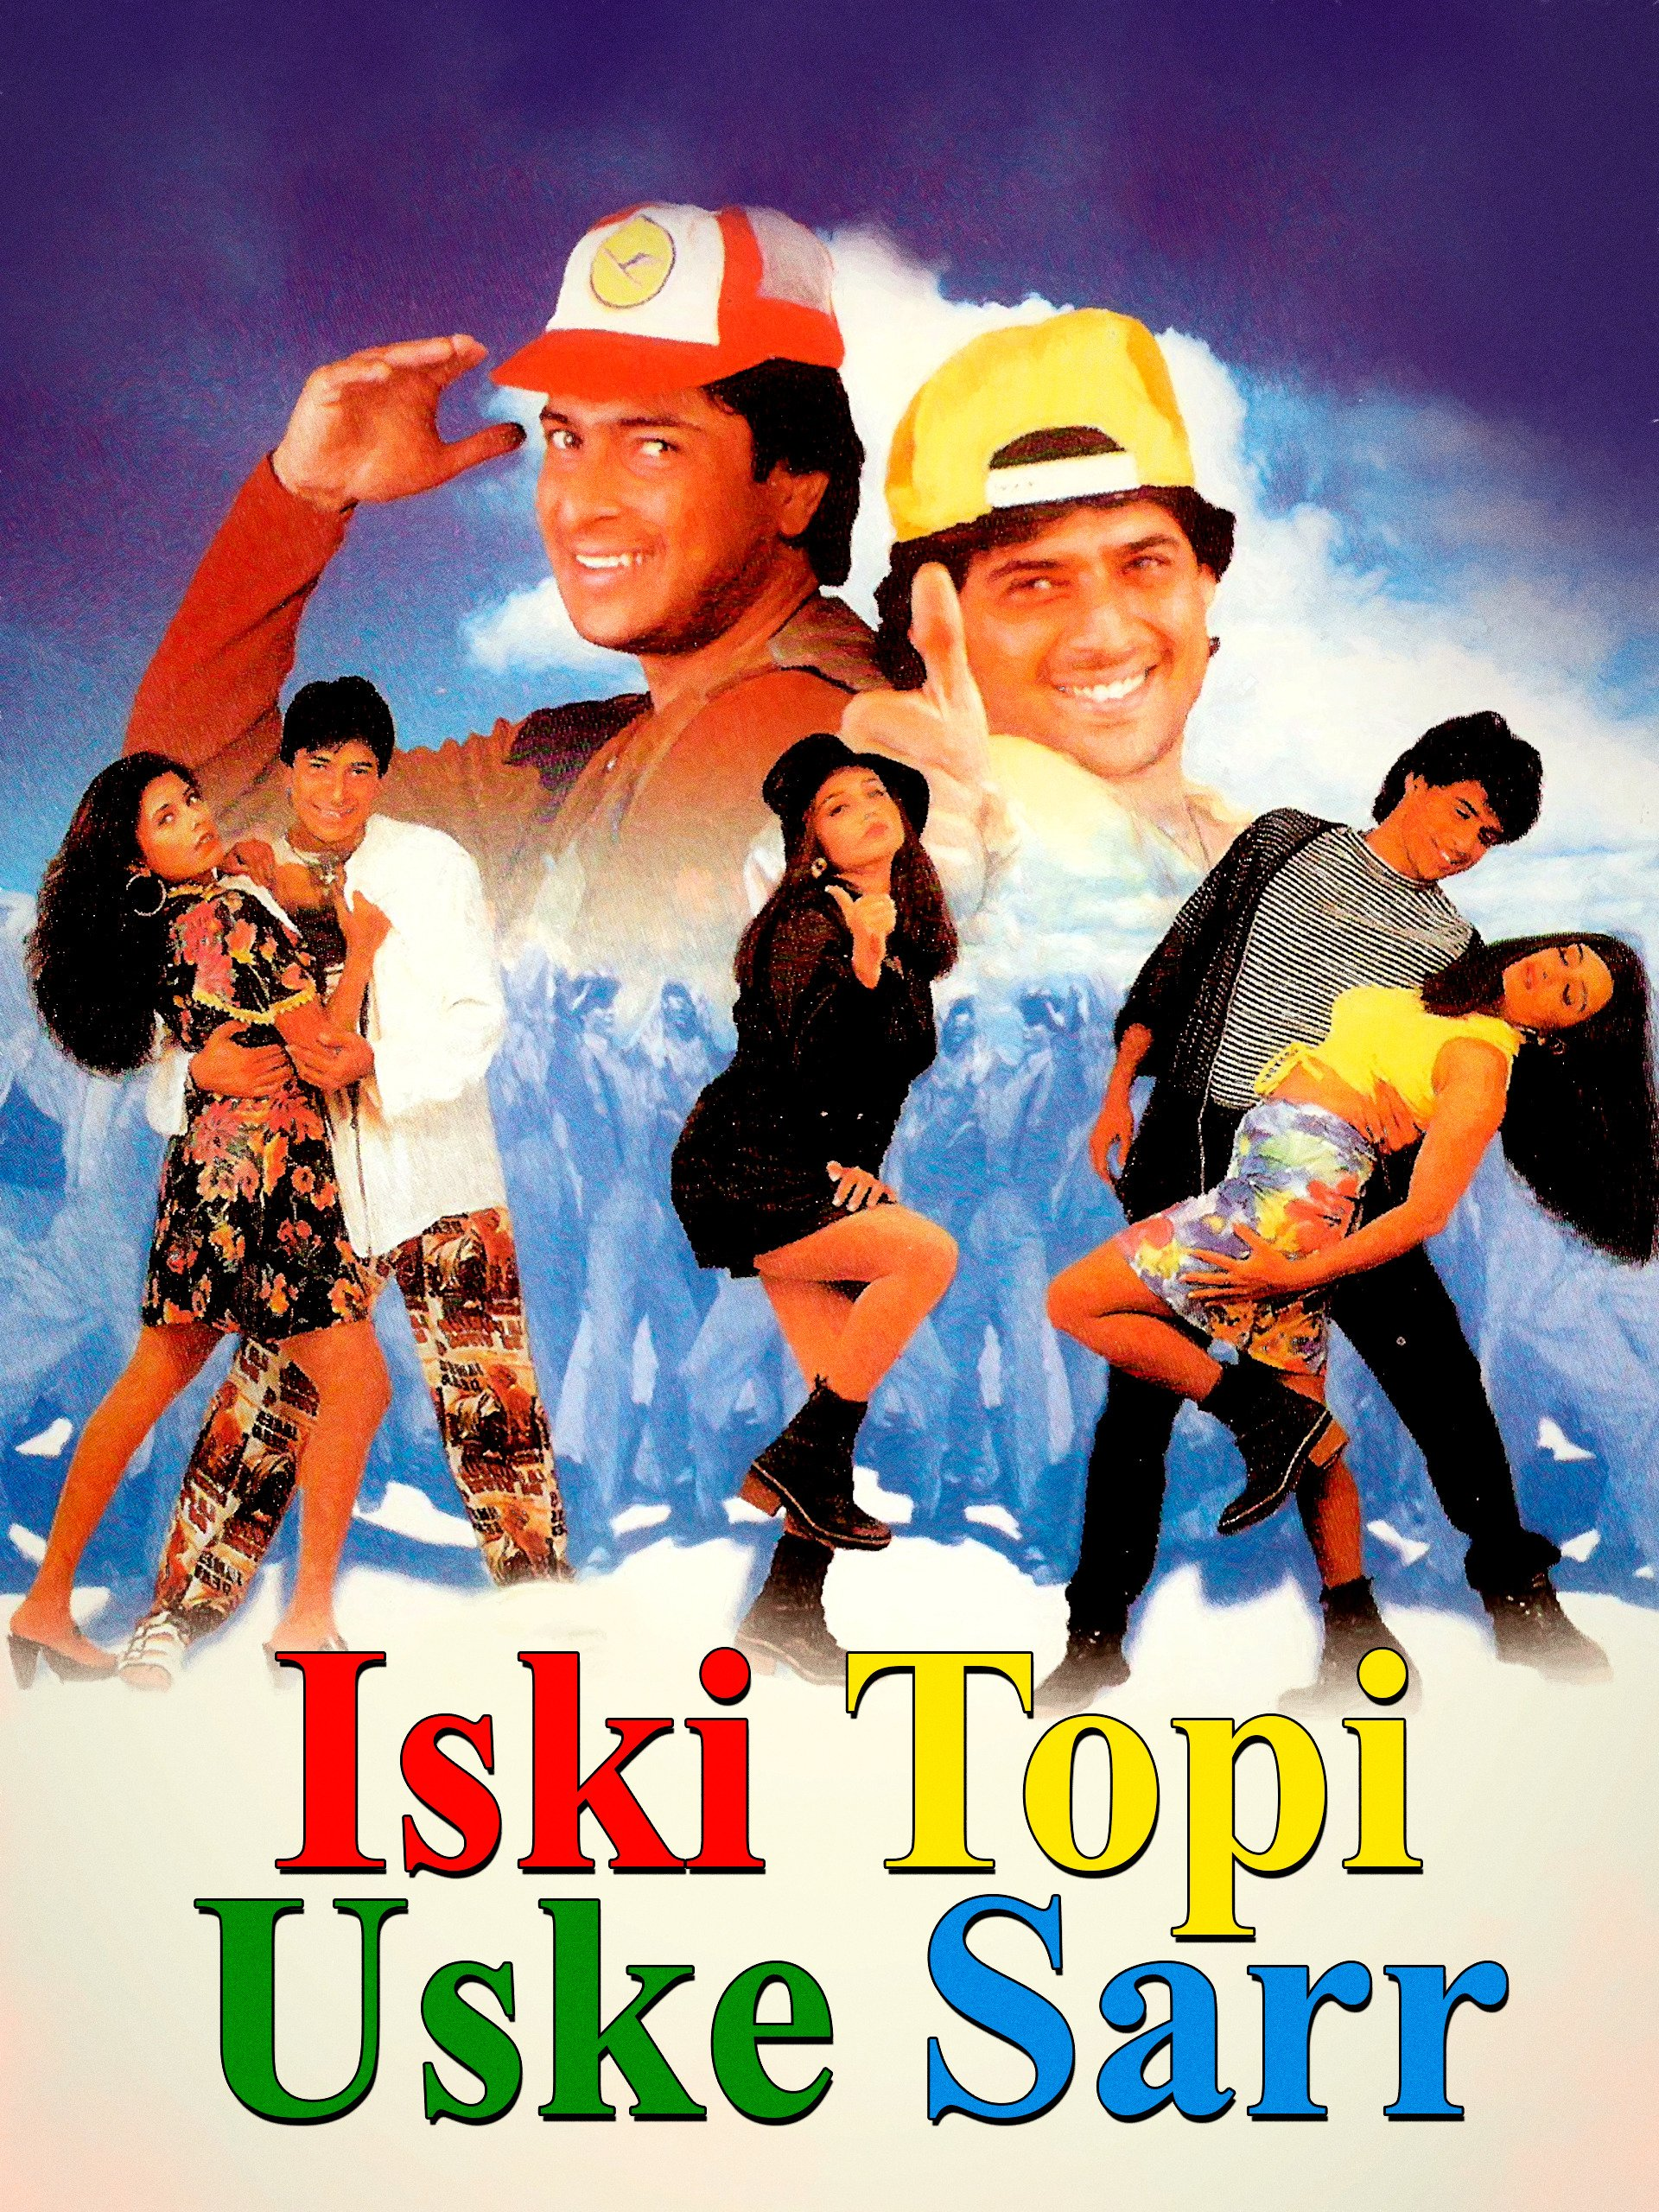 iski topi uske sir movie song